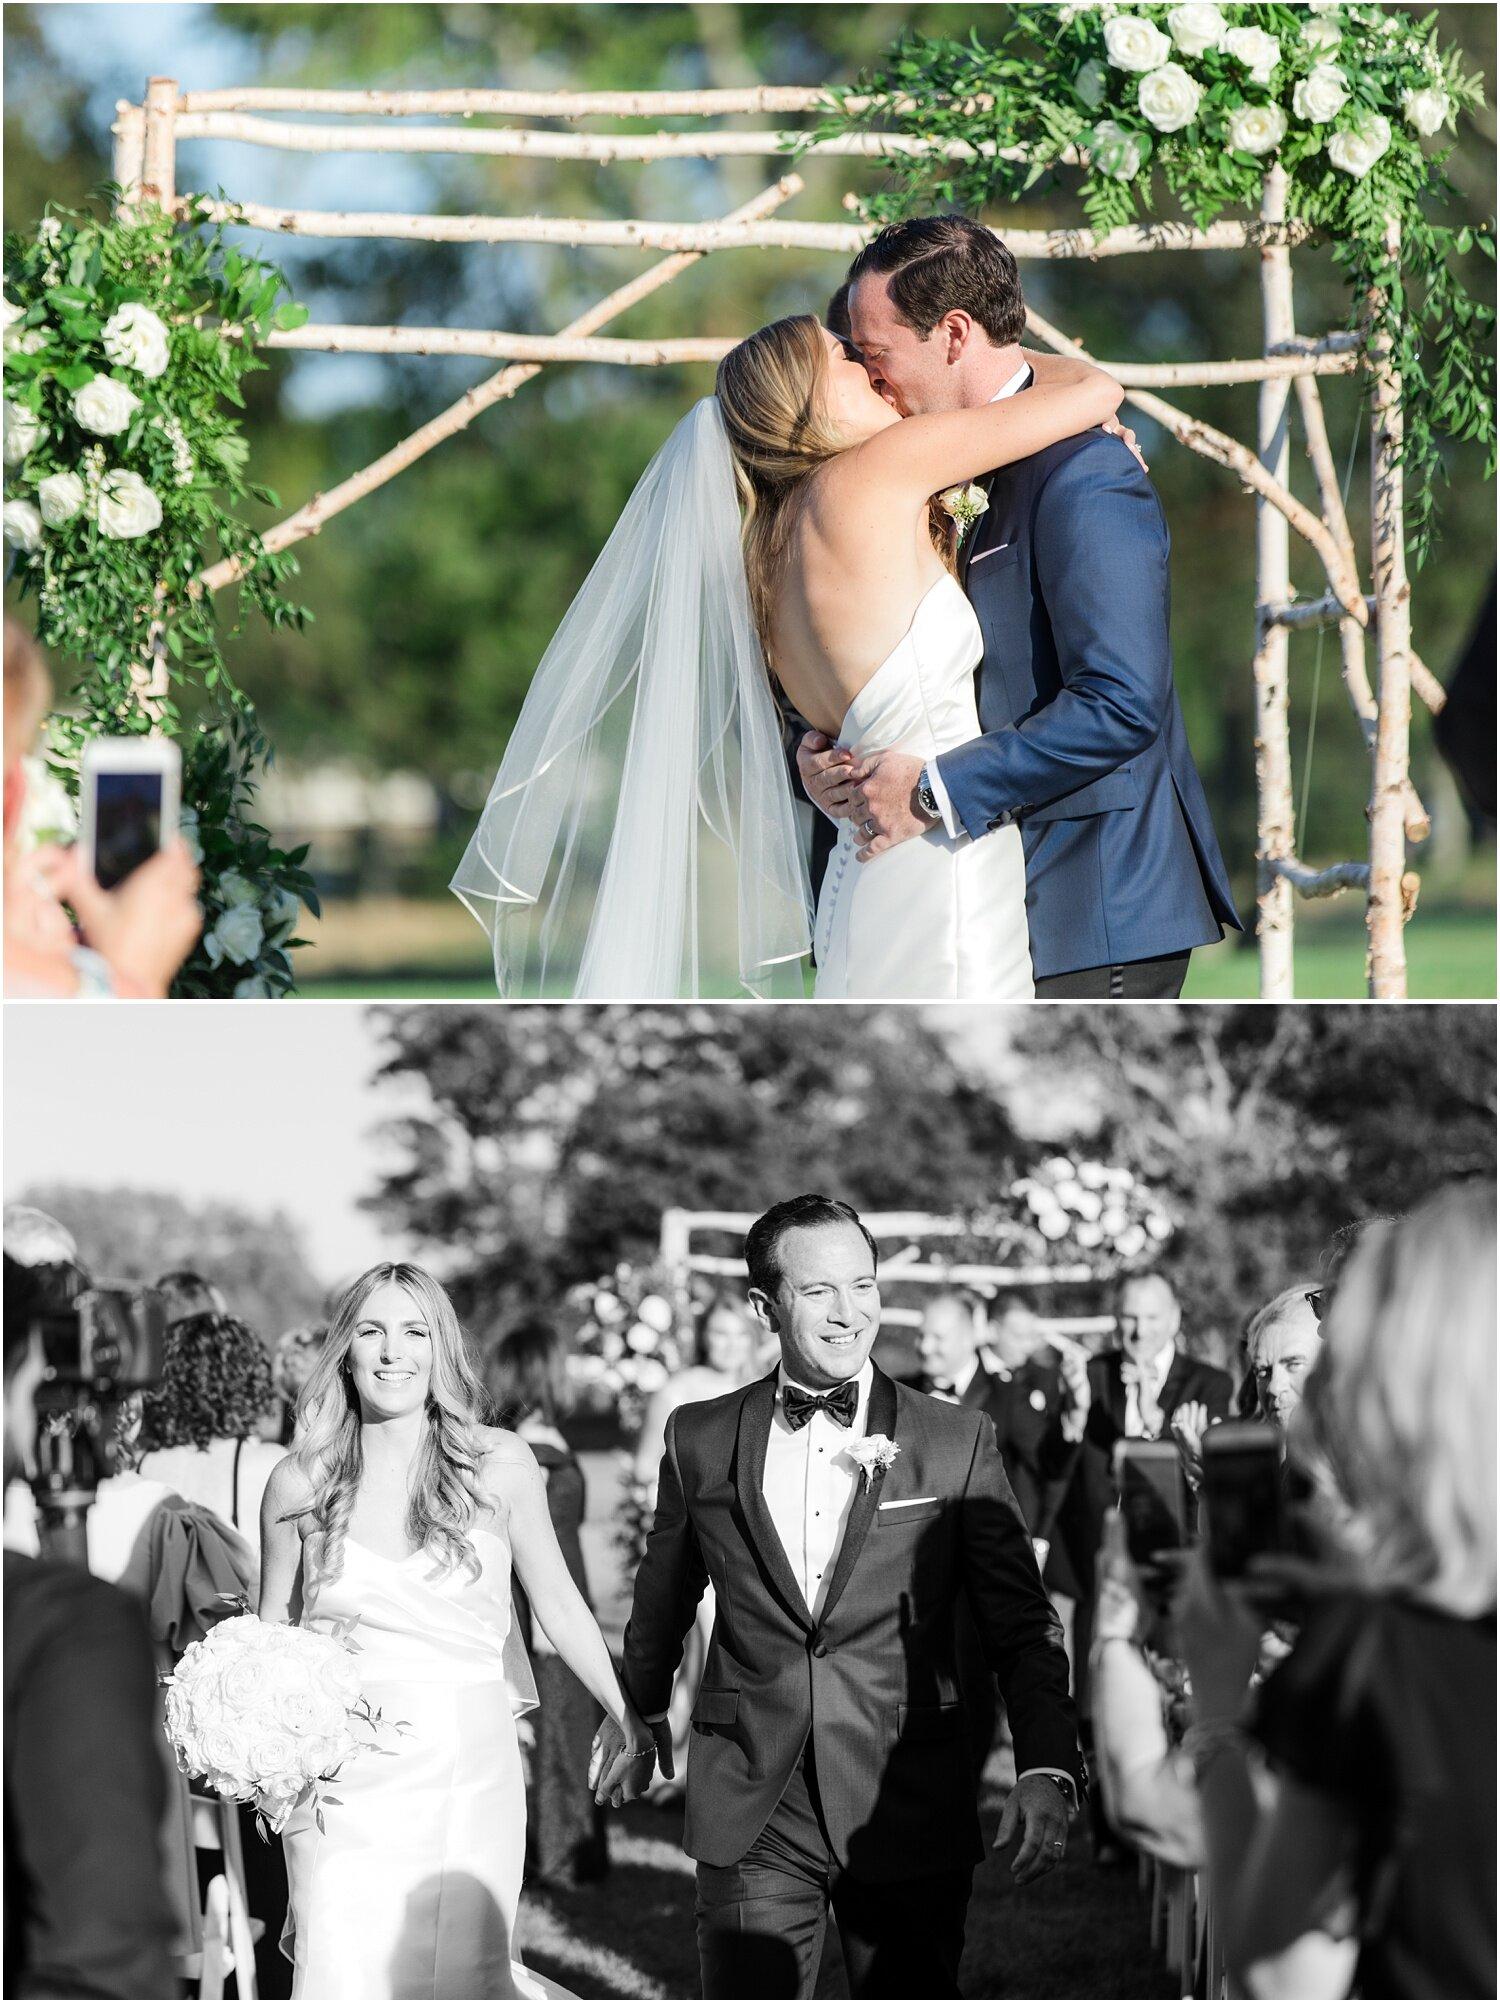 Wedding ceremony exit at Spring Lake Golf Club